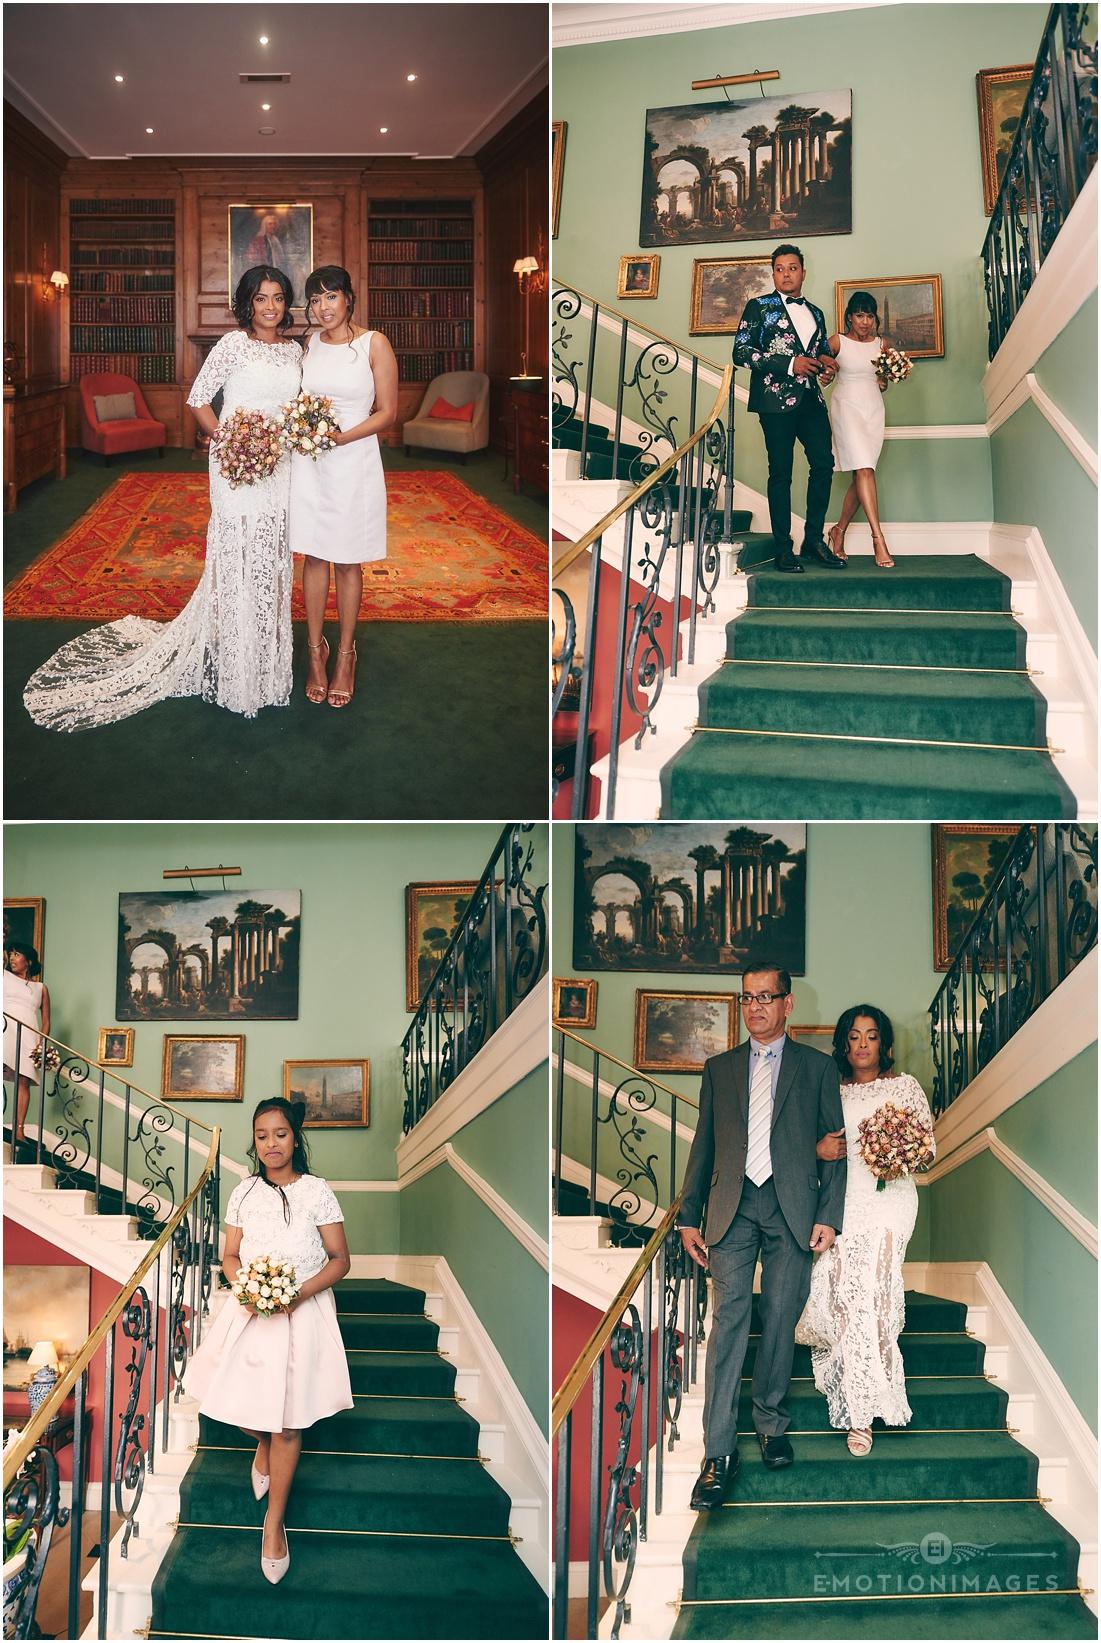 Searcys_Knightsbridge_London_wedding_e-motion_images_009.JPG